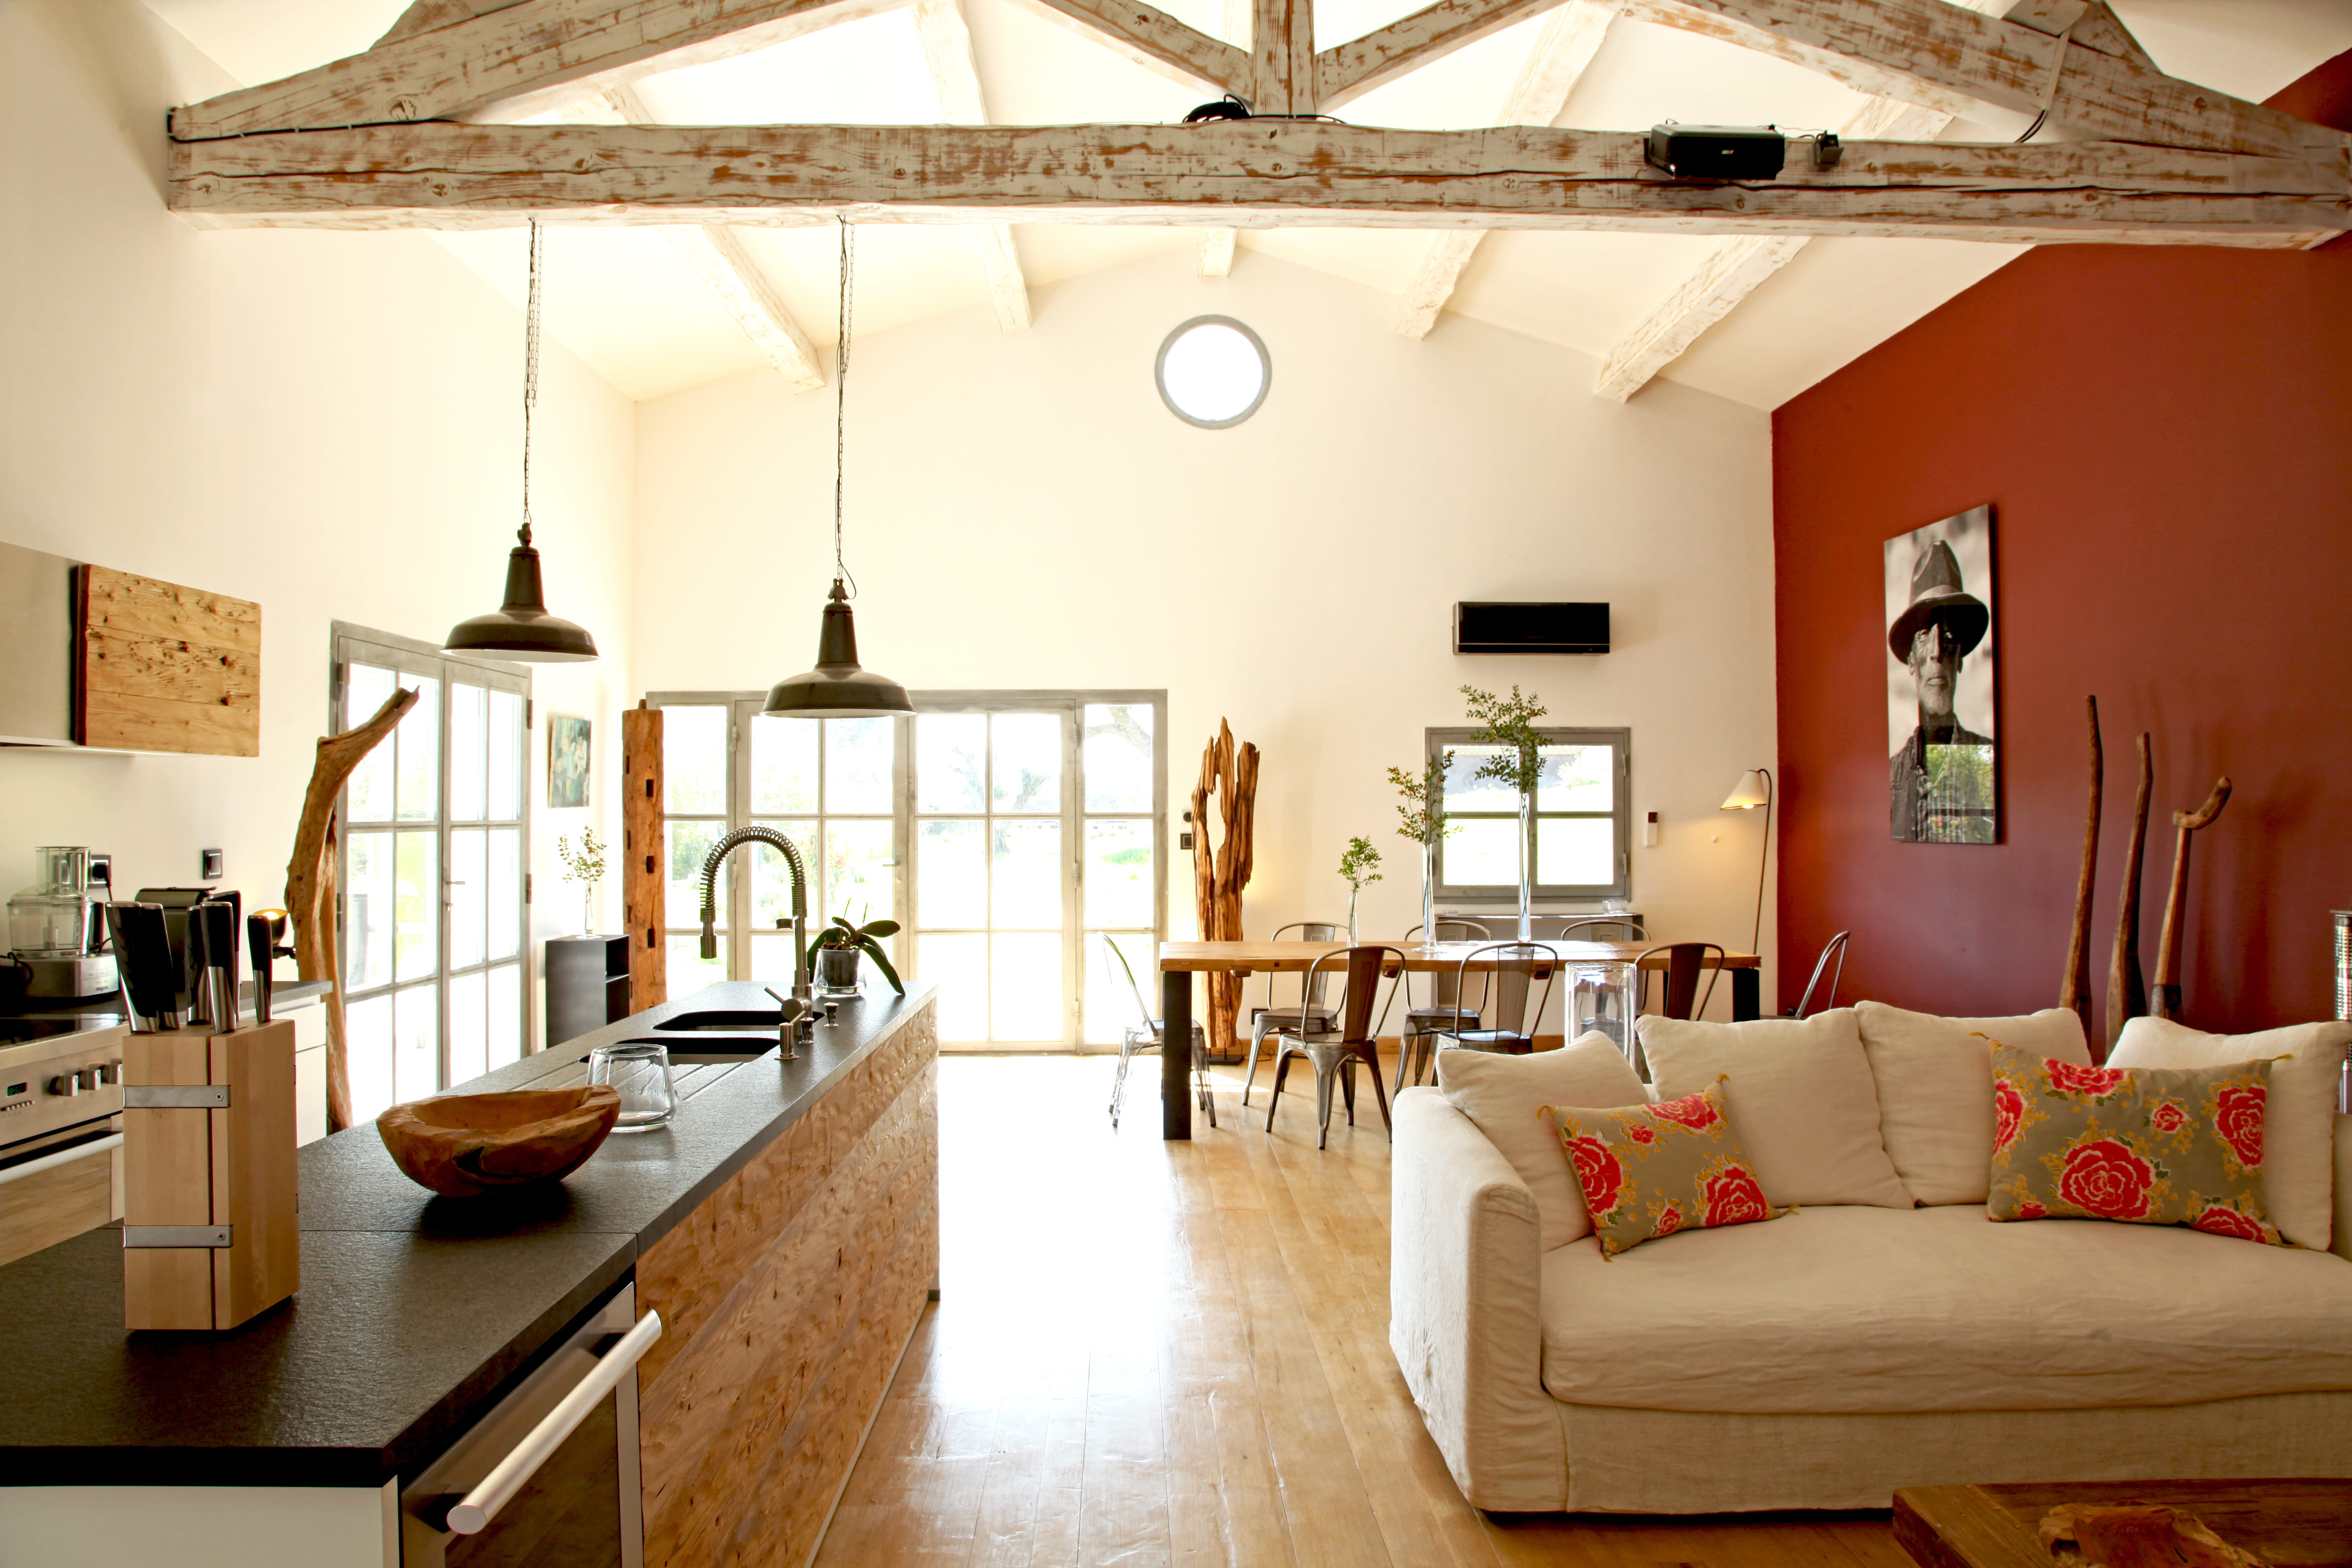 Chambre A Coucher Adulte Bois Blanc : Indogatecom  Salon Ambiance Moderne